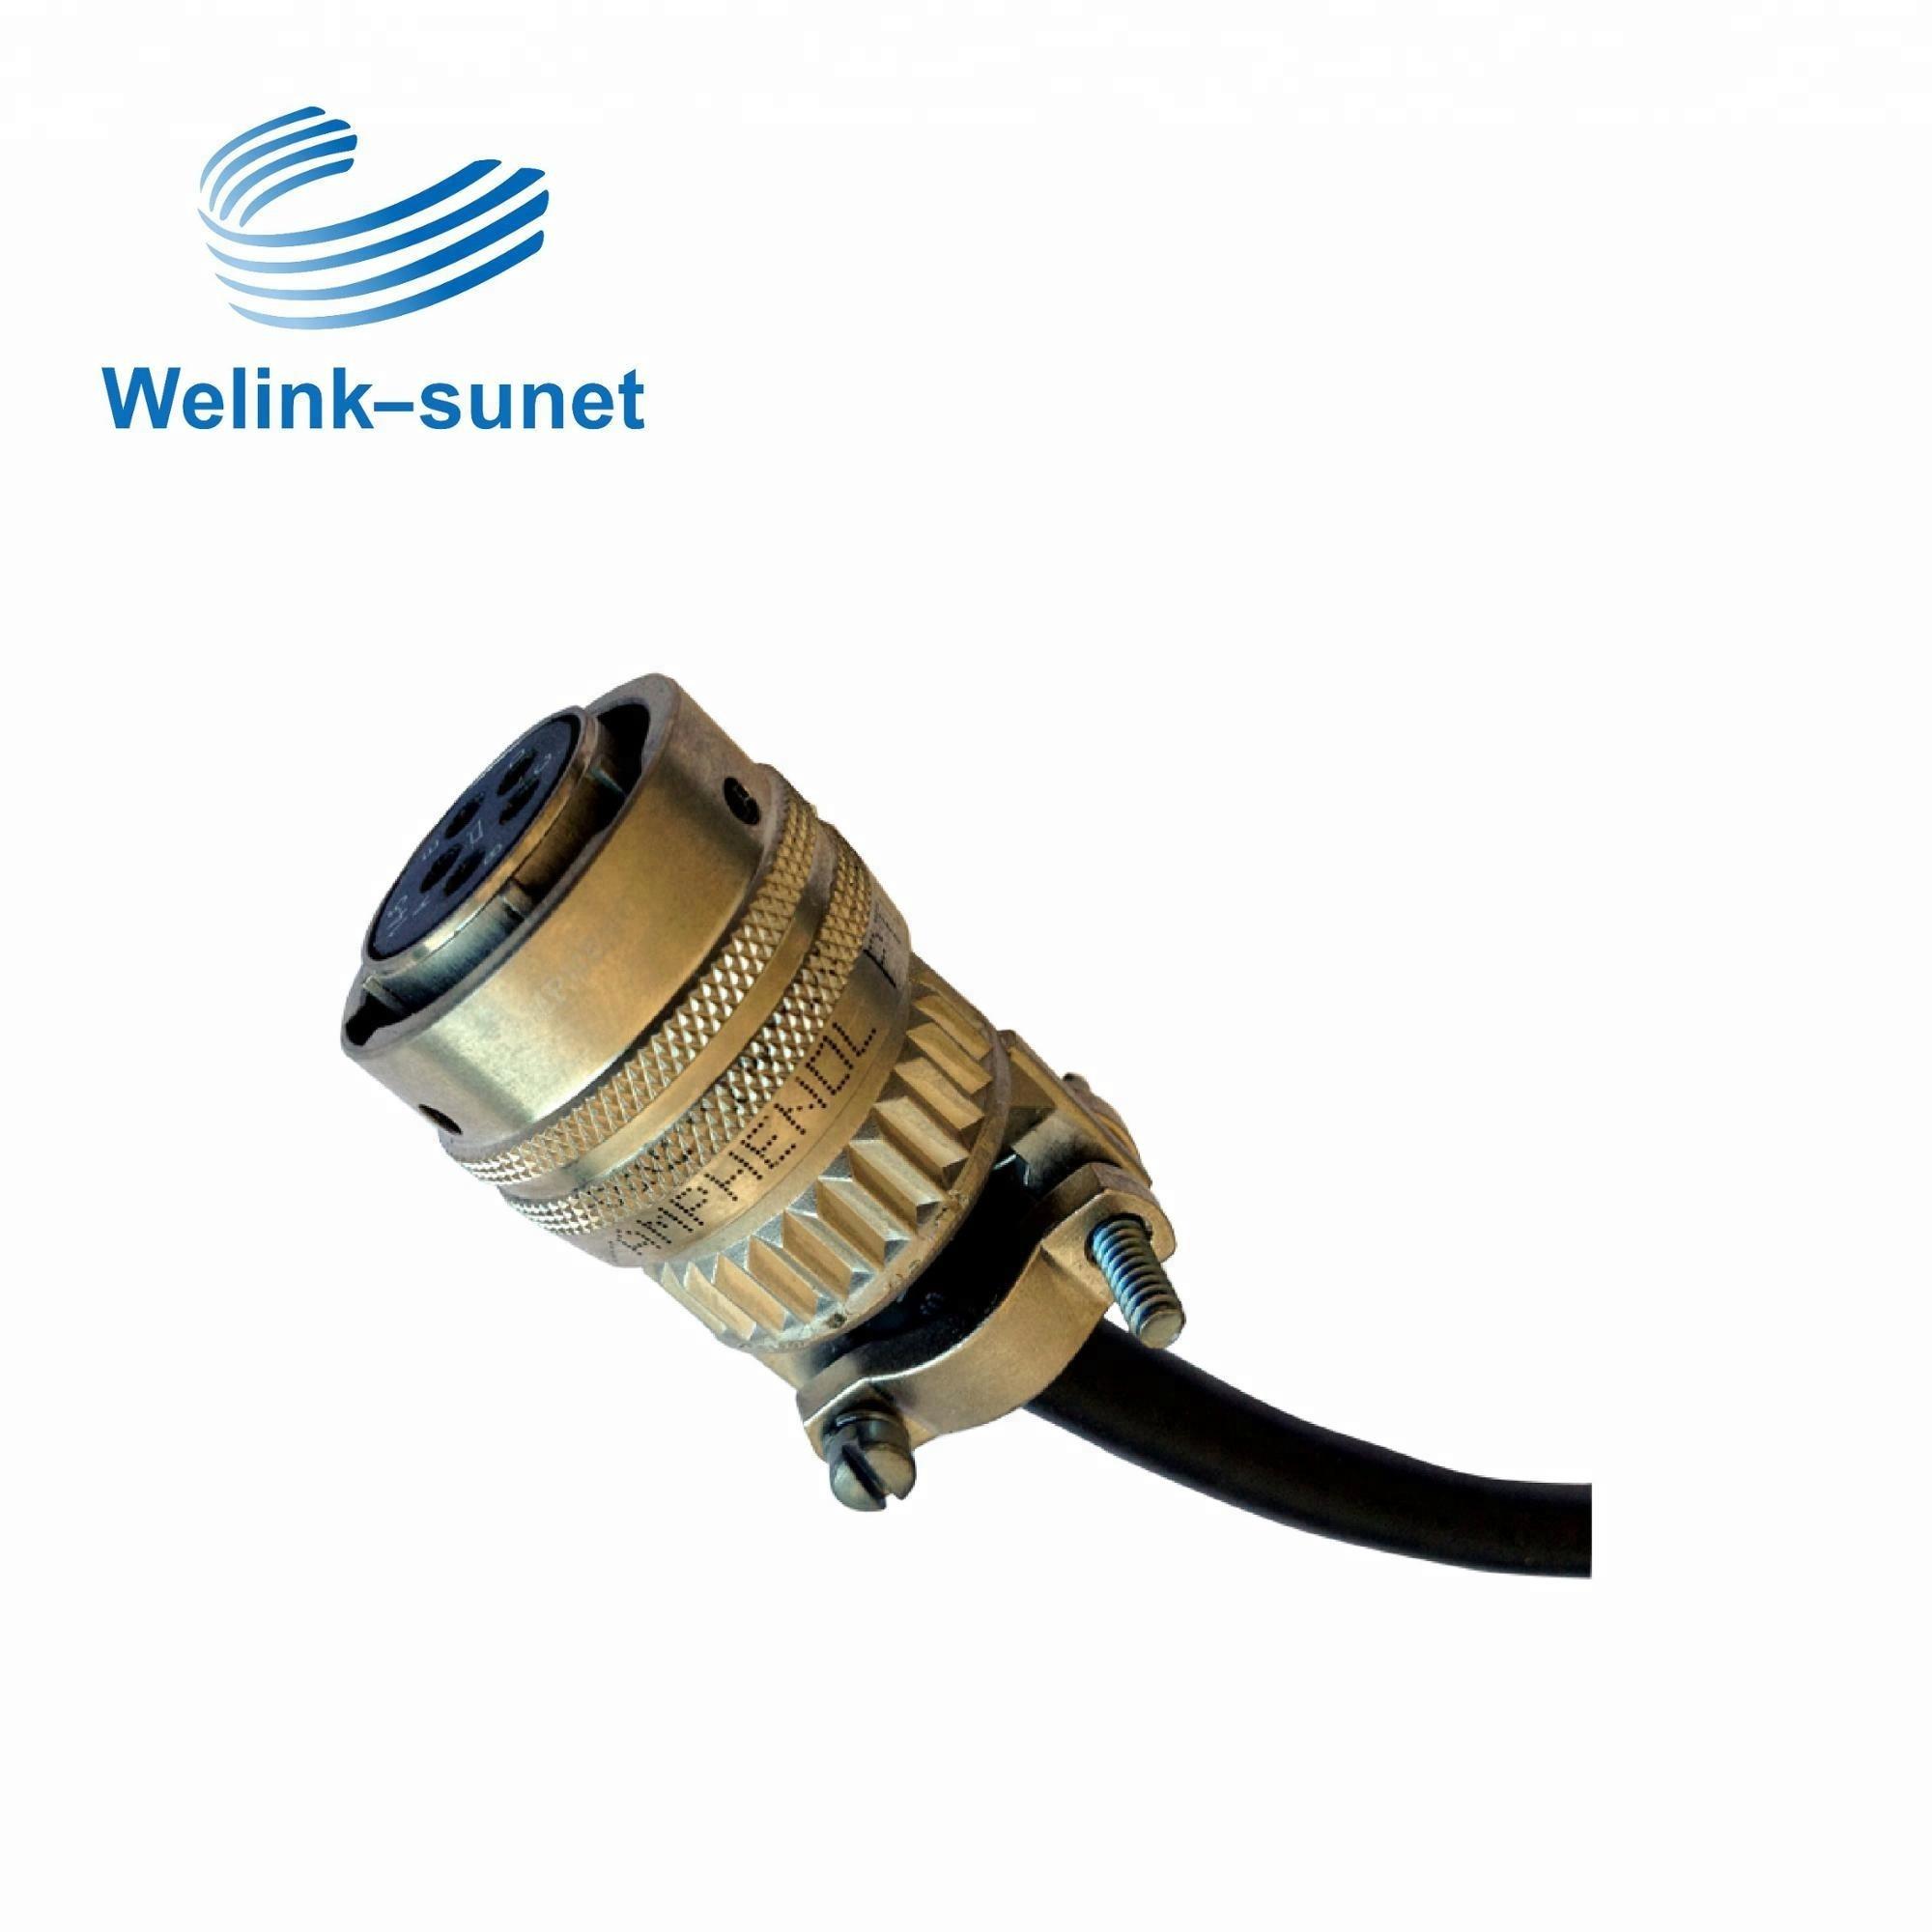 hight resolution of industrial robots yeonhab yh3116f lapp flexibility wiring harness